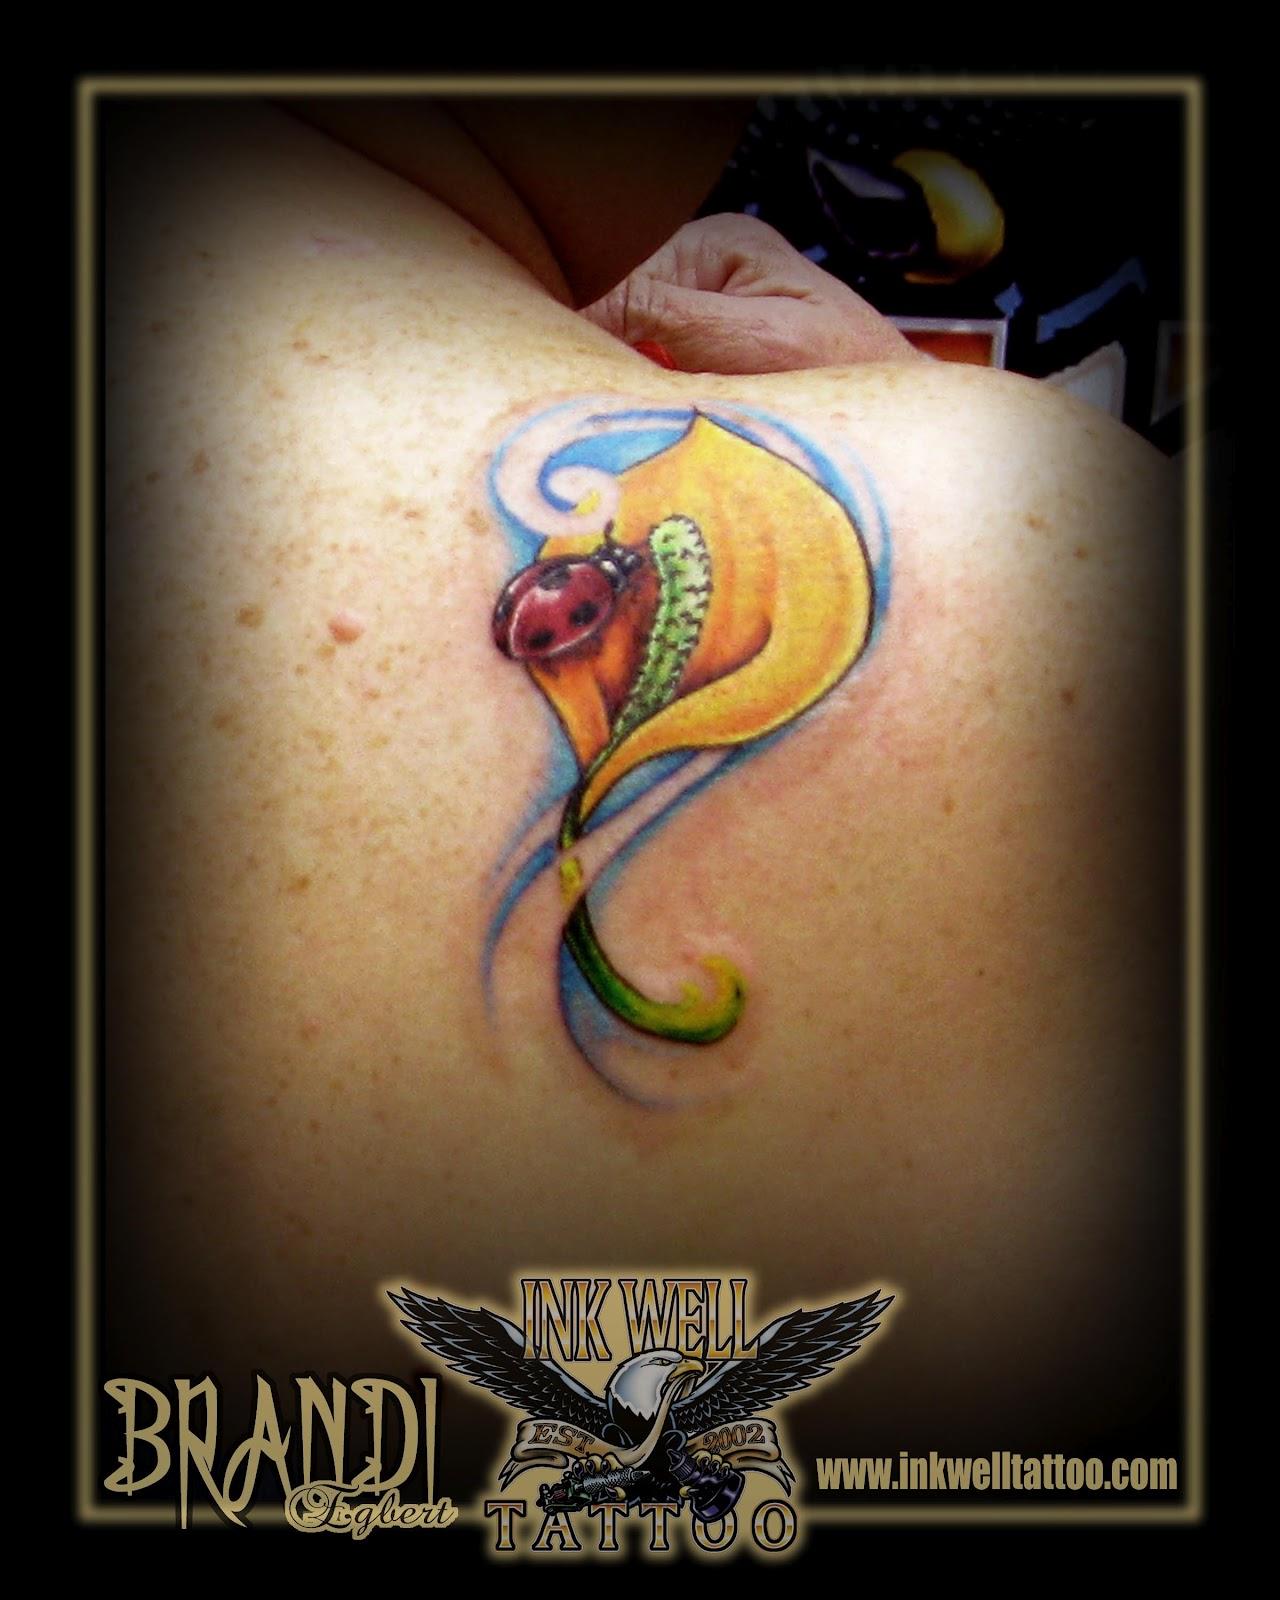 brandi egbert ink well tattoo ladybug and peace lily